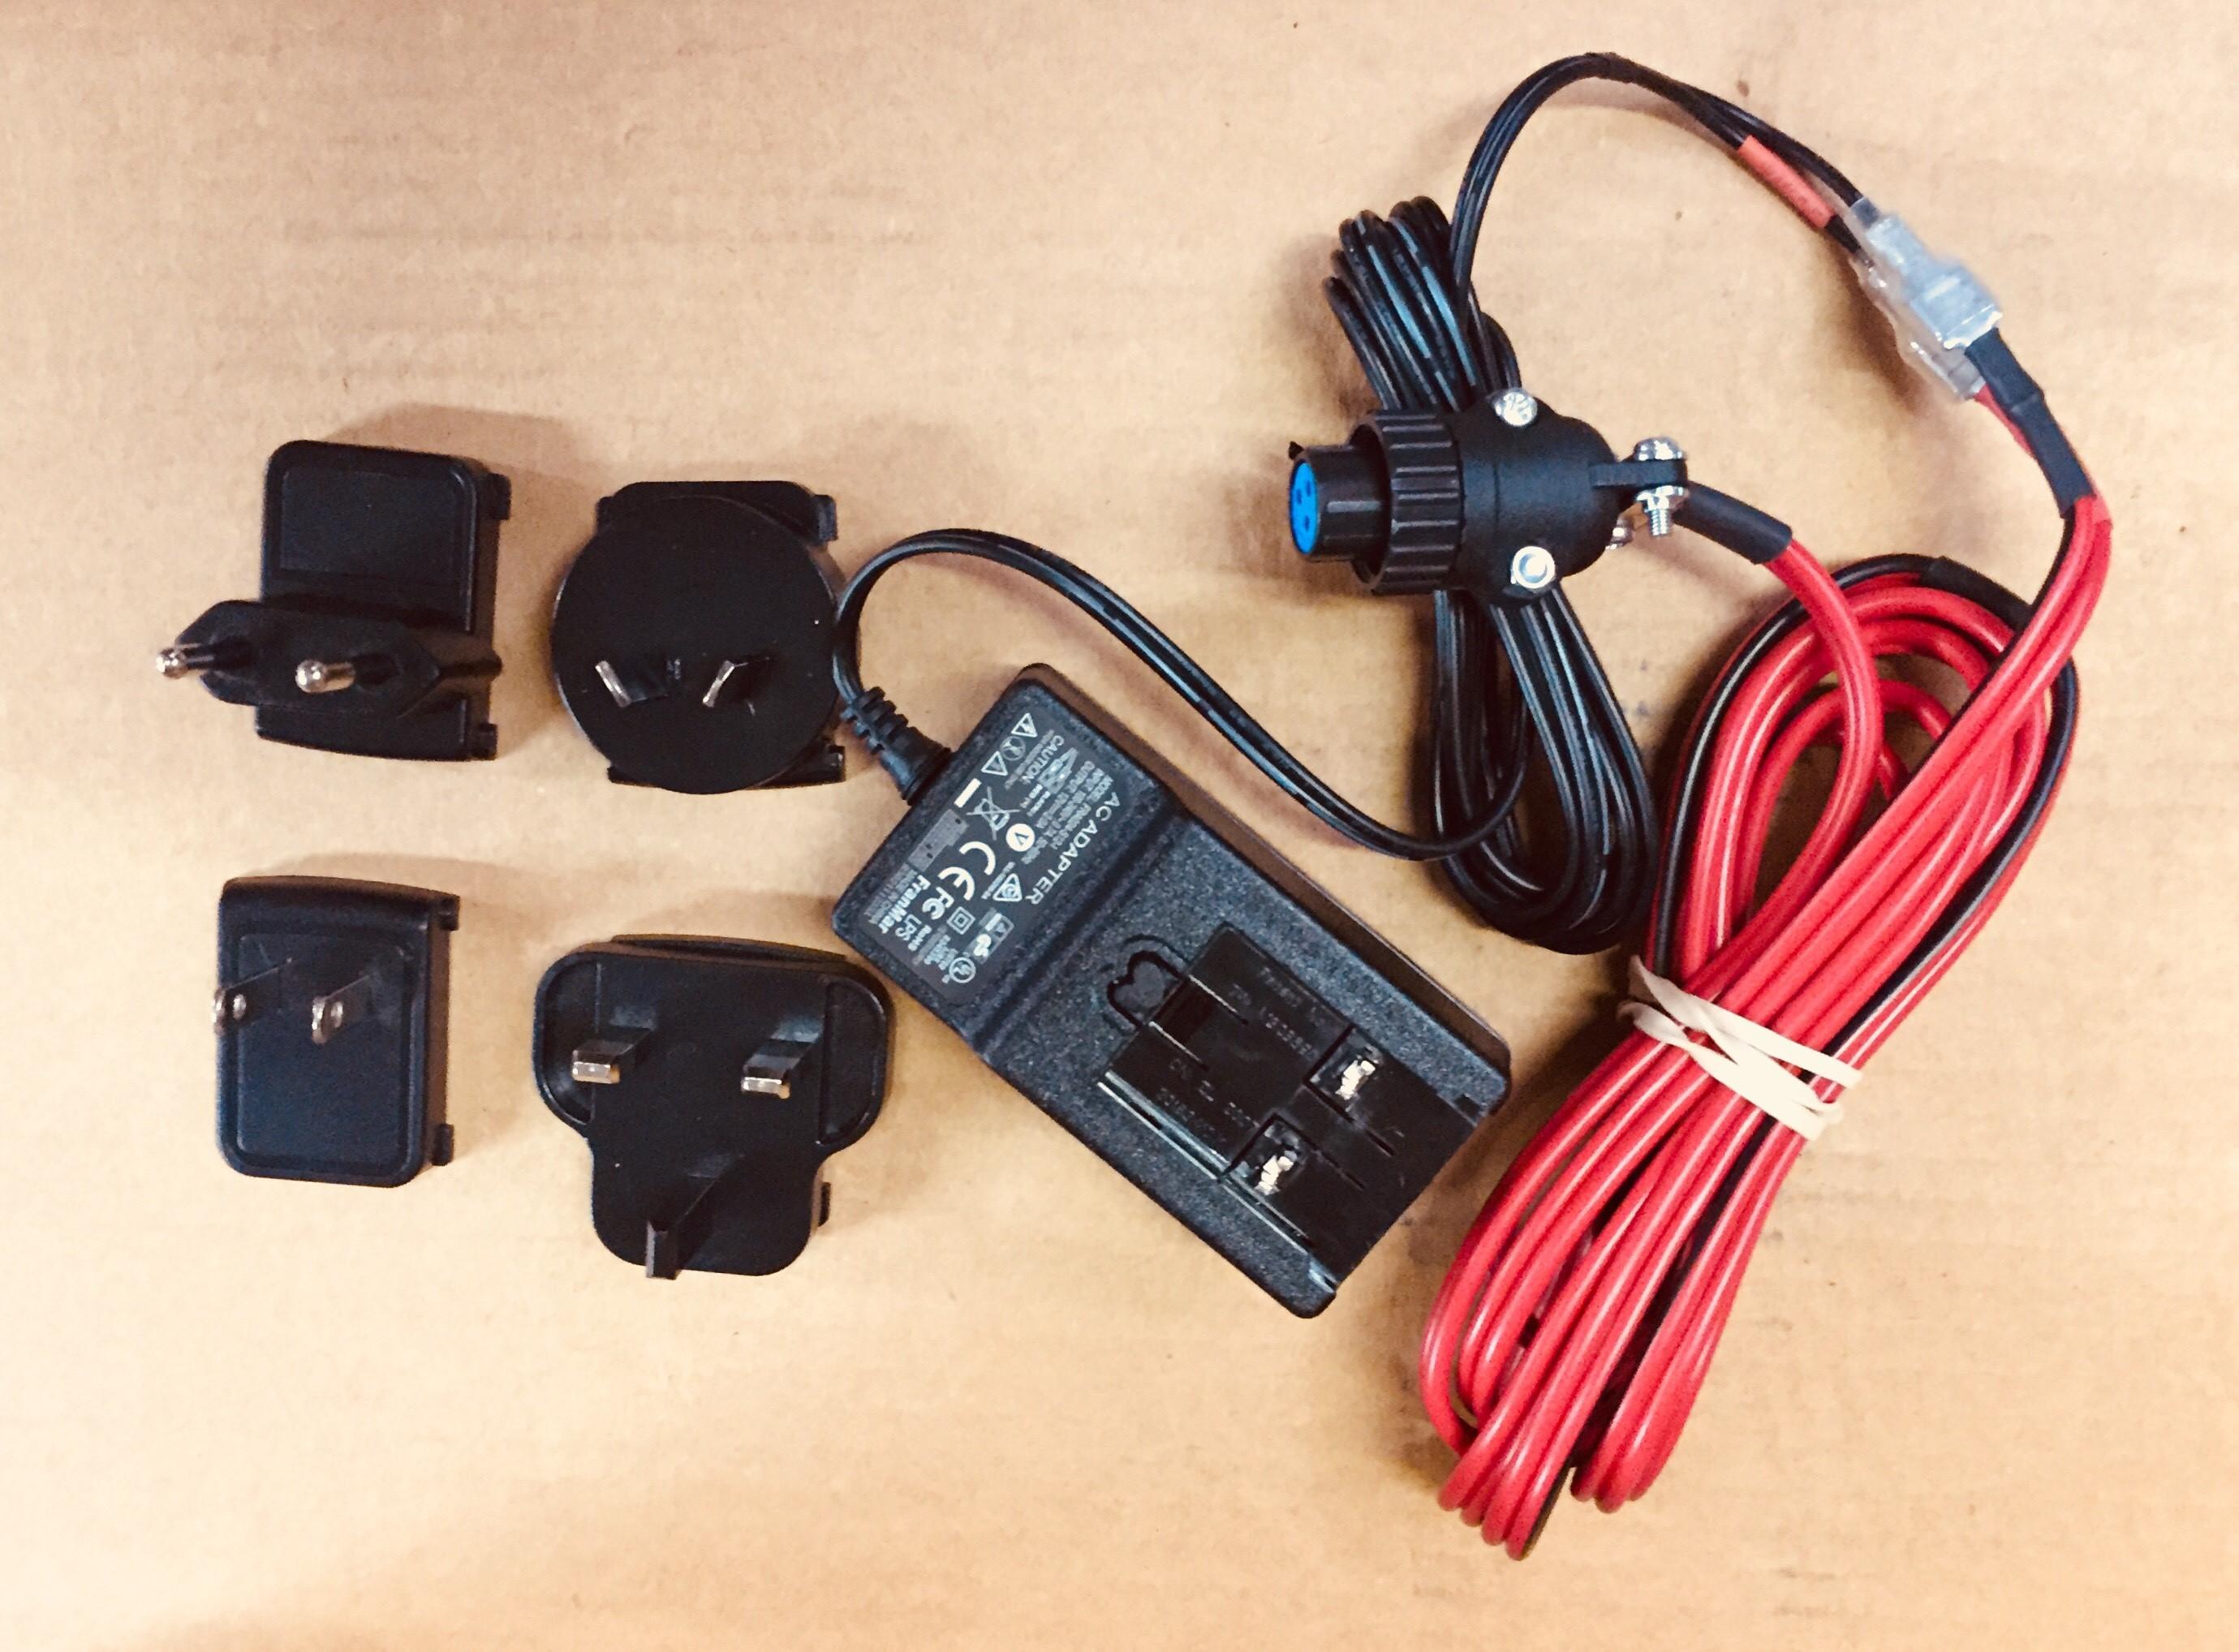 TruTest 3000 series charging kit